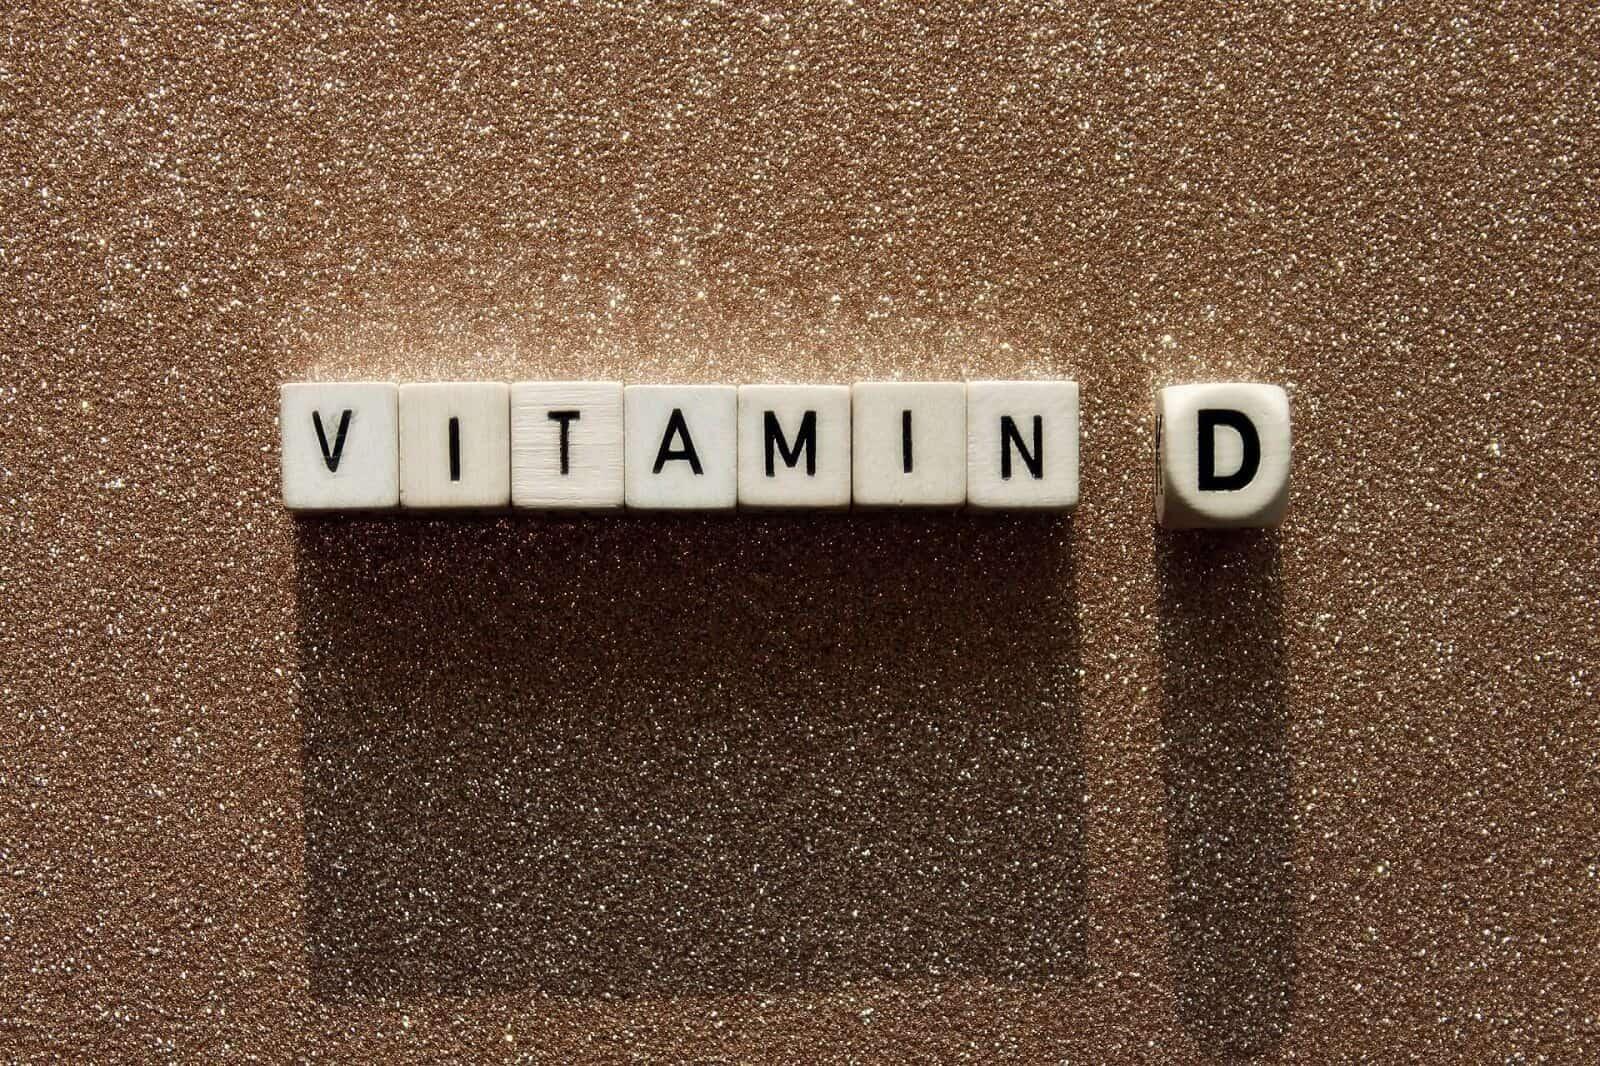 vitamin-d-featured